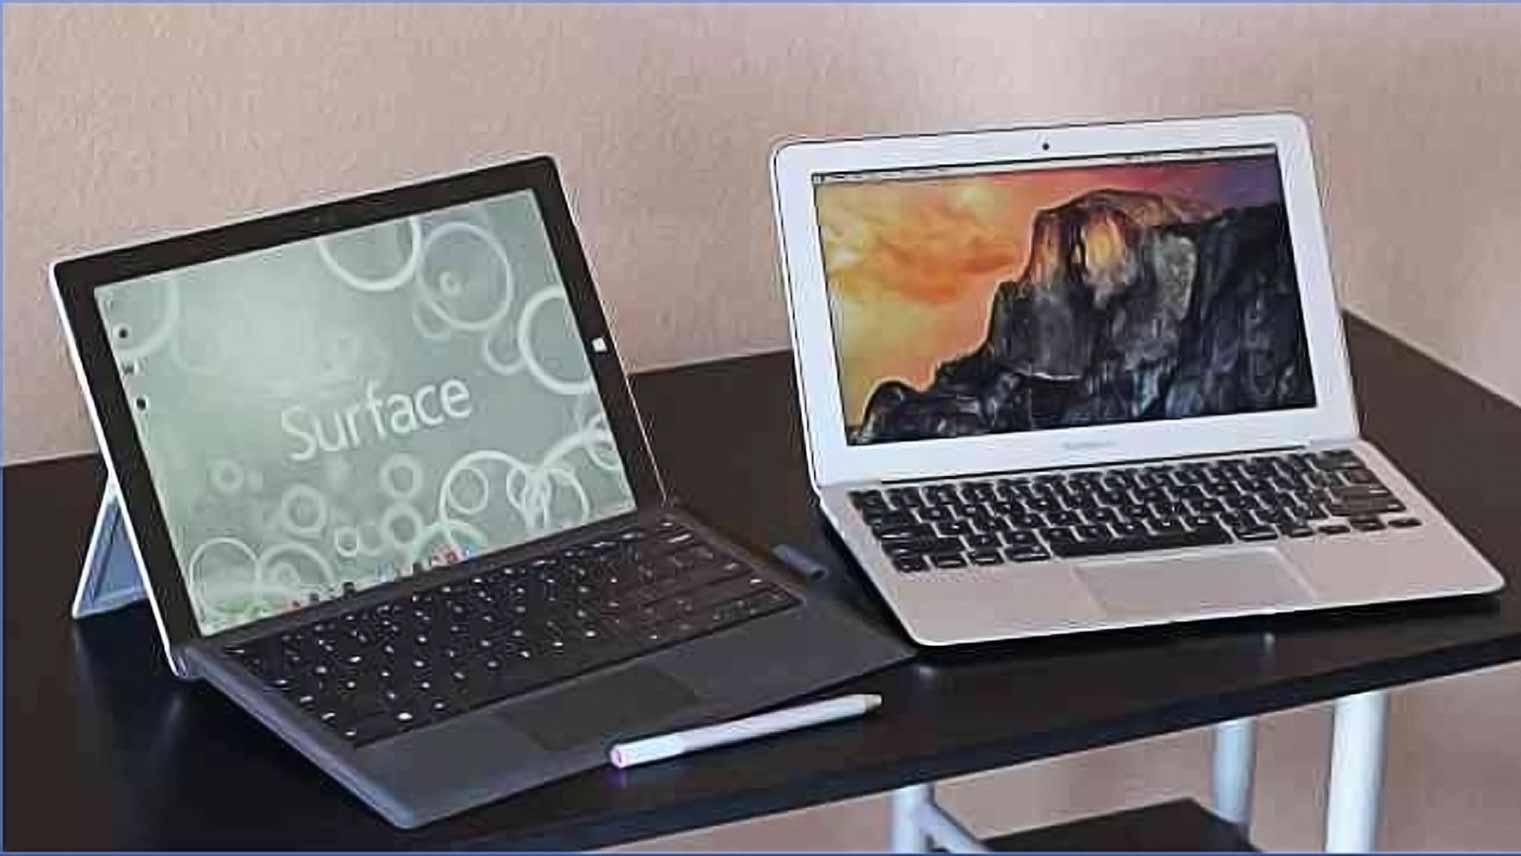 Perbedaan Laptop dan Netbook